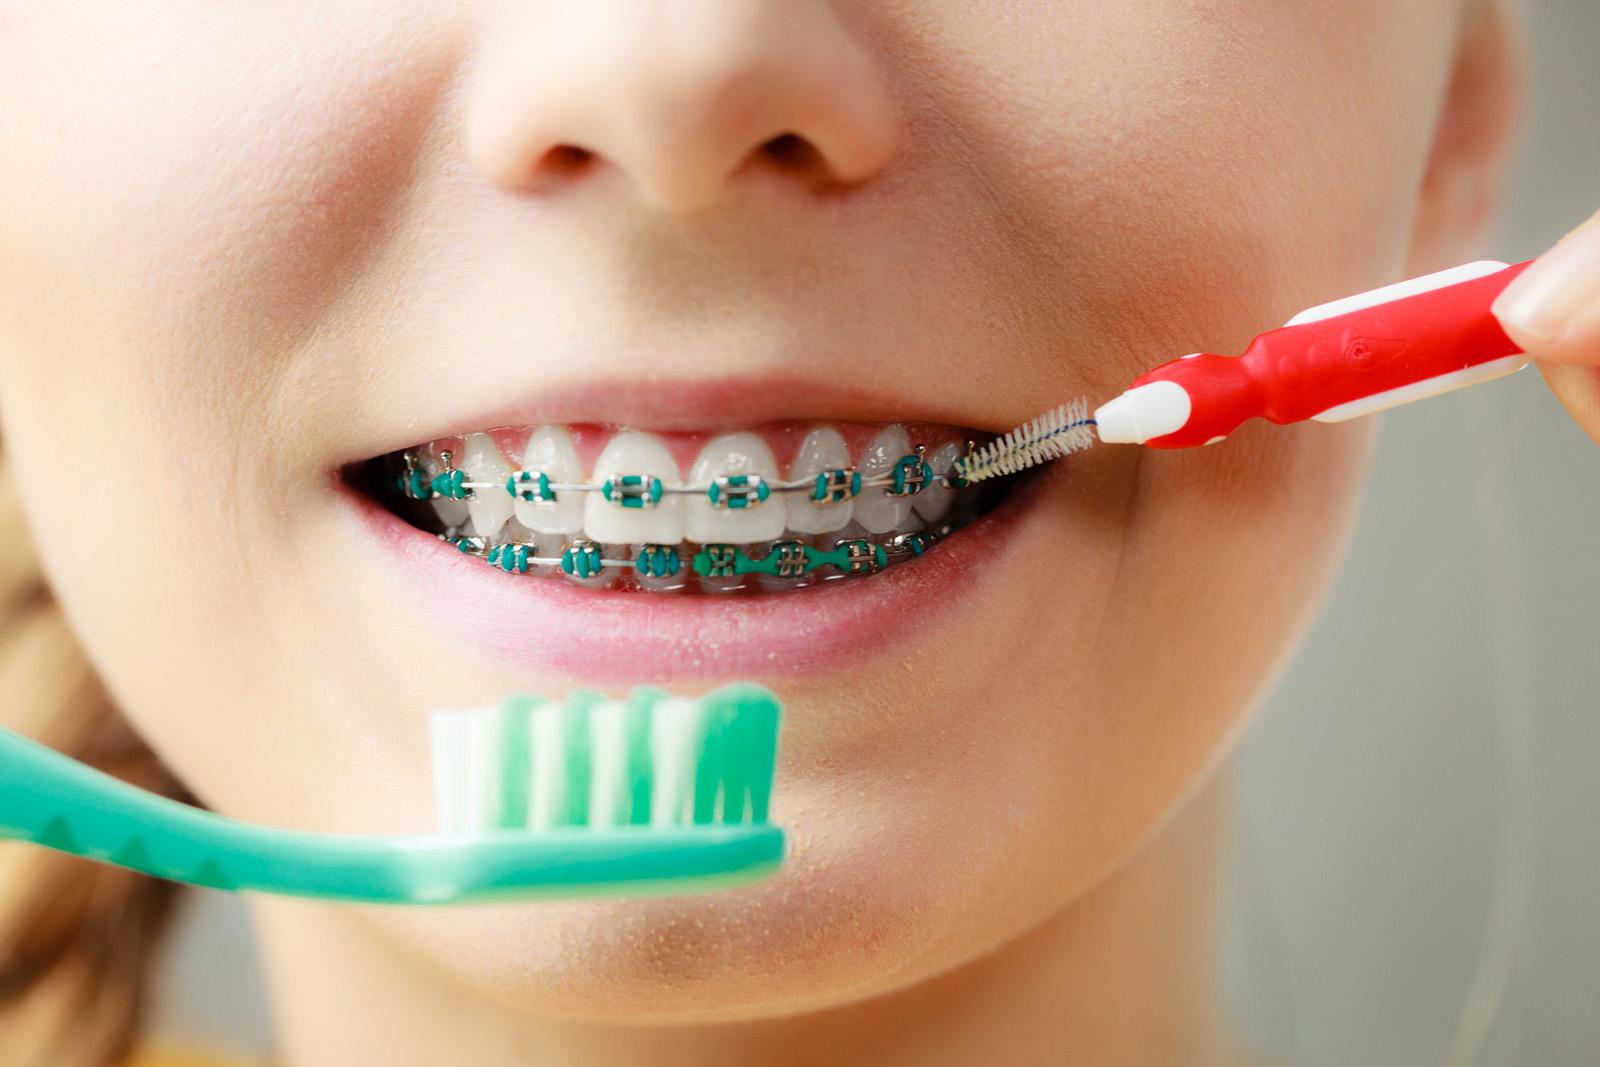 Girl Brushing Teeth with Braces